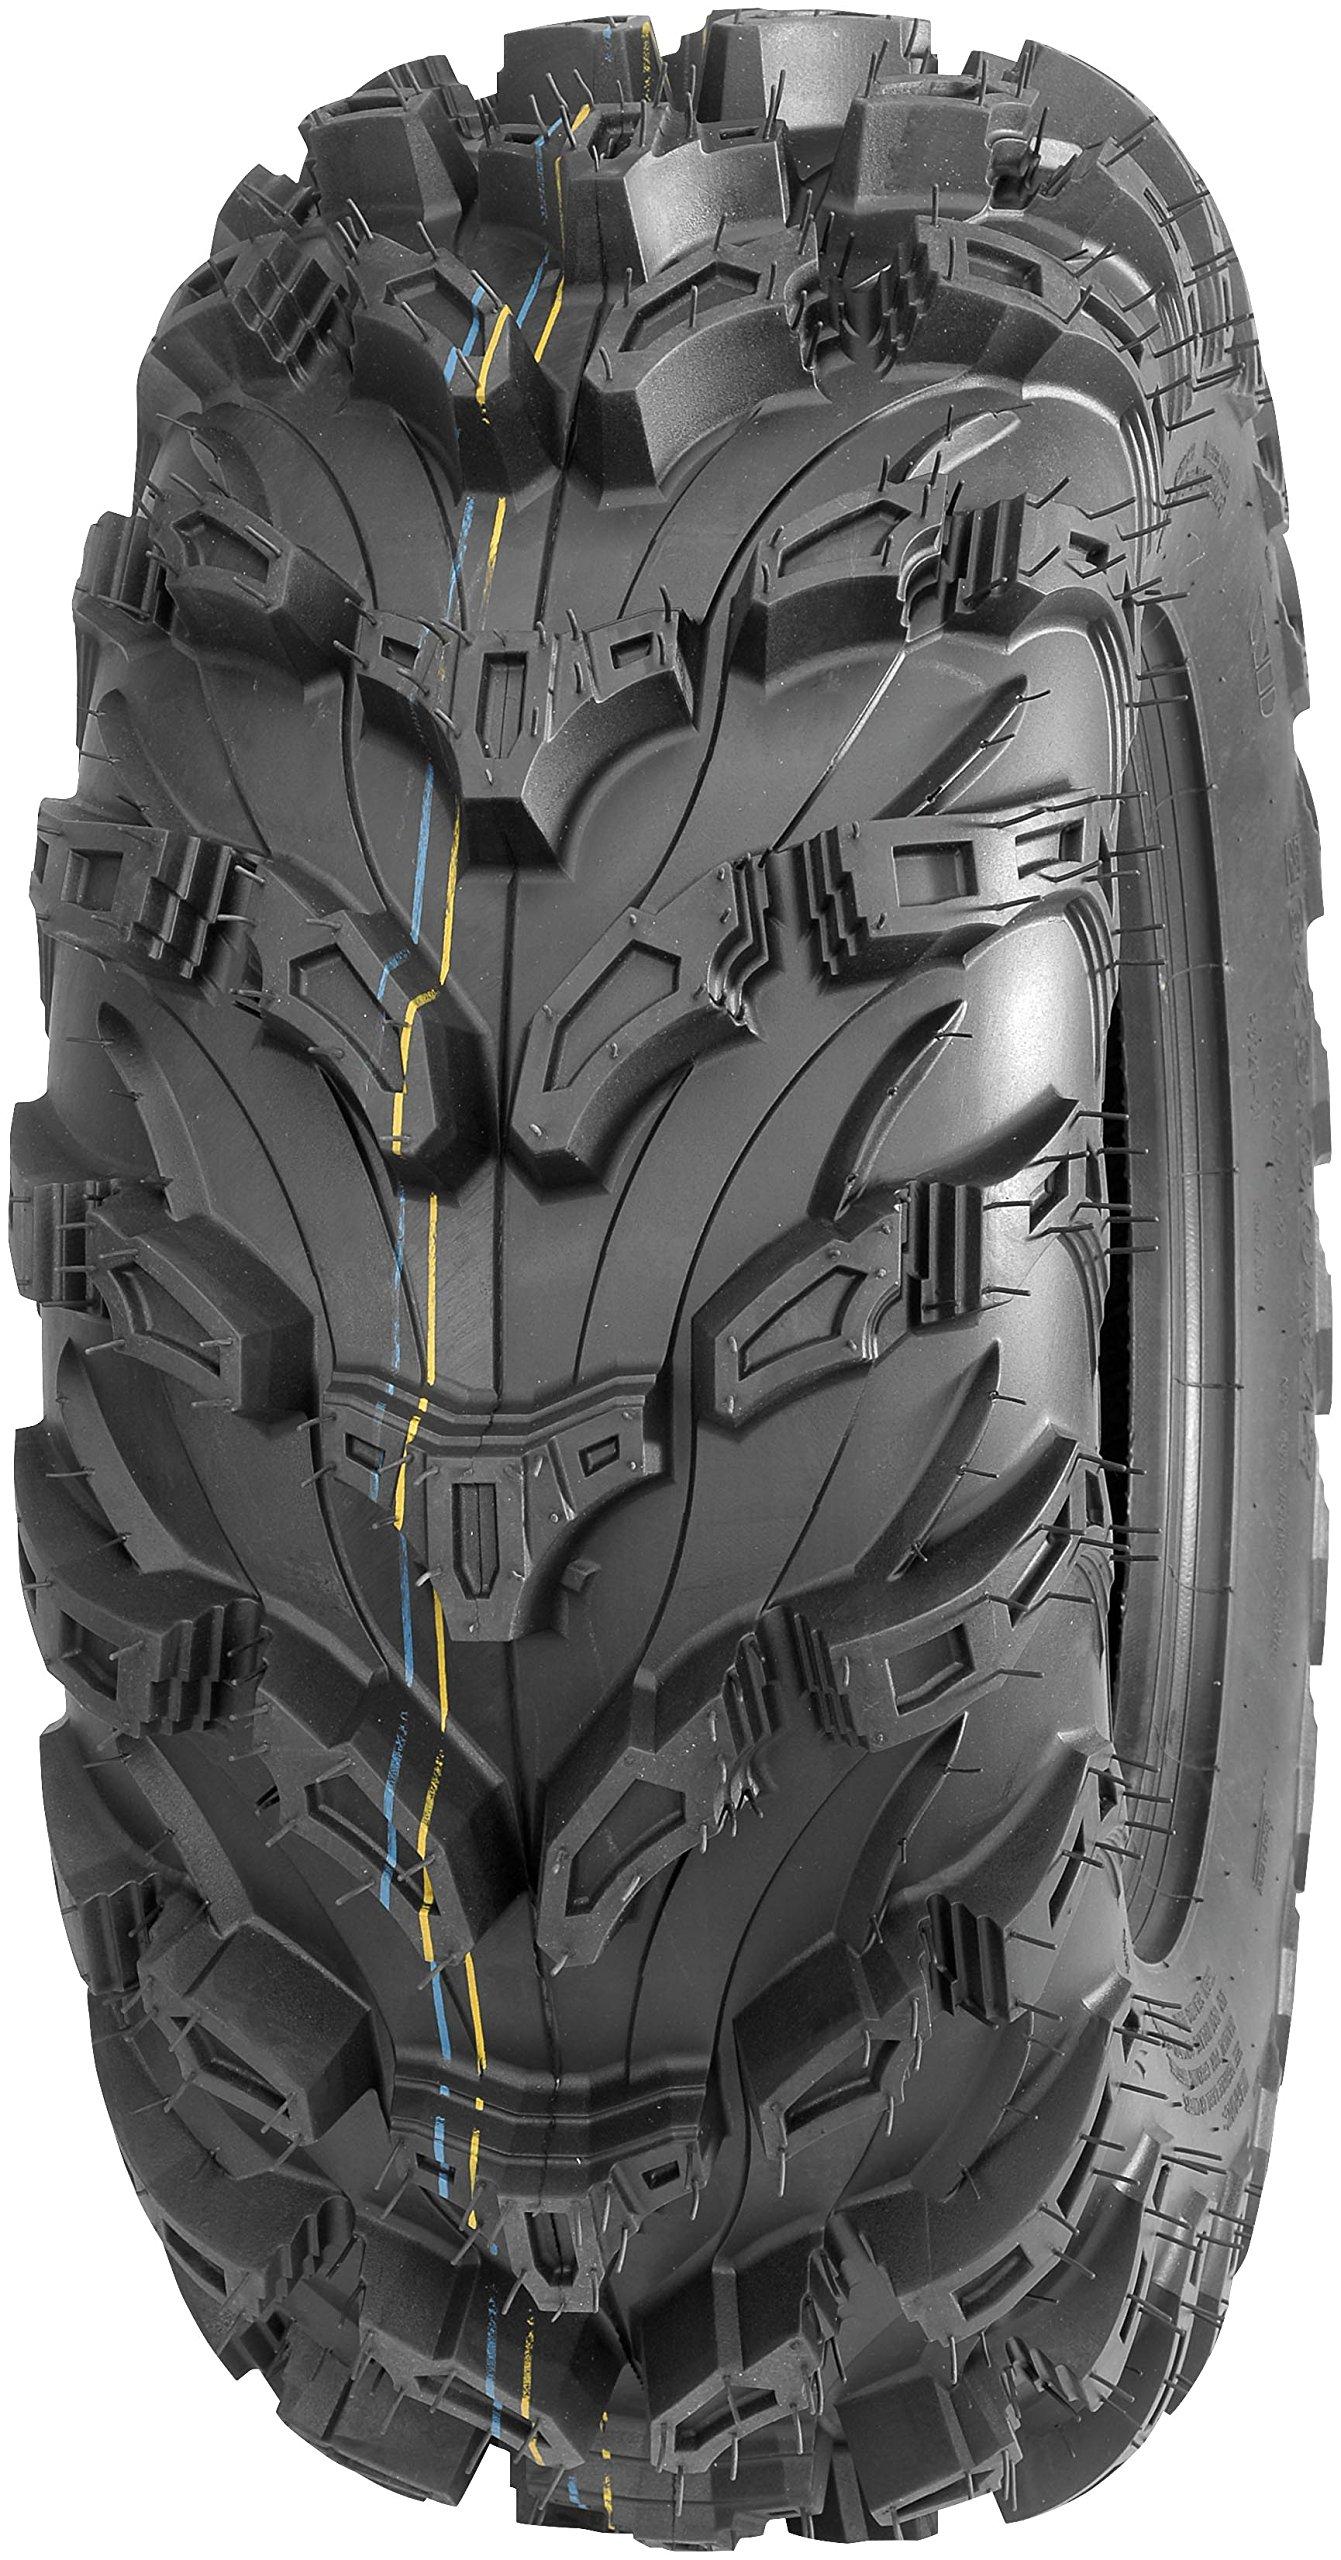 Quadboss QBT672 26x9R12 8-Ply Front Tire P3029-26X9-12